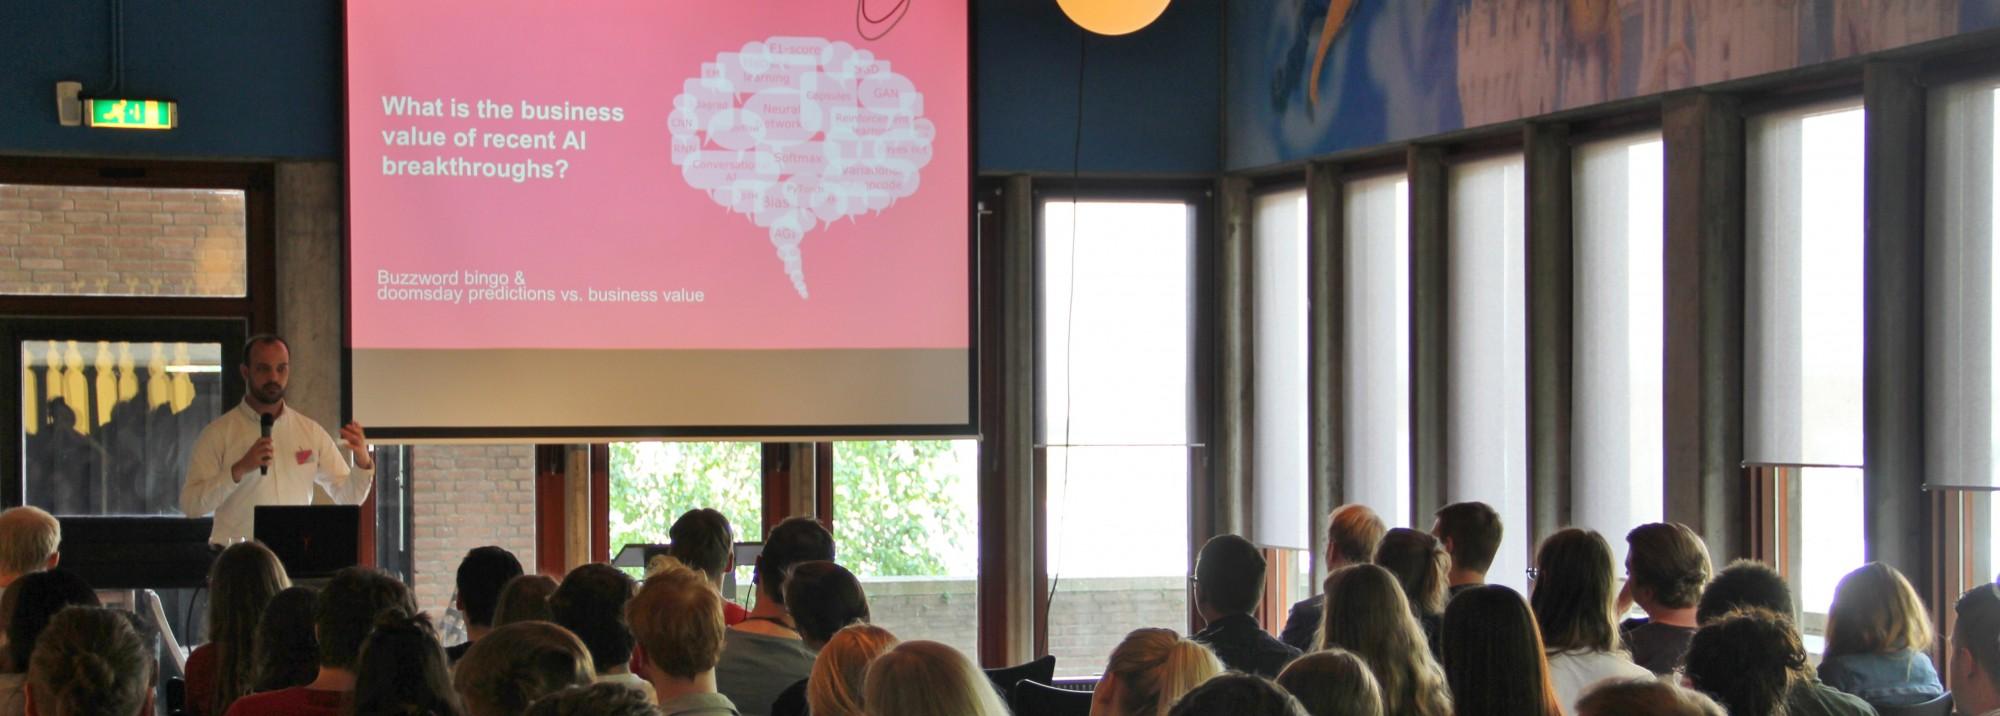 blog-image-ai-language-event-radboud-nijmegen